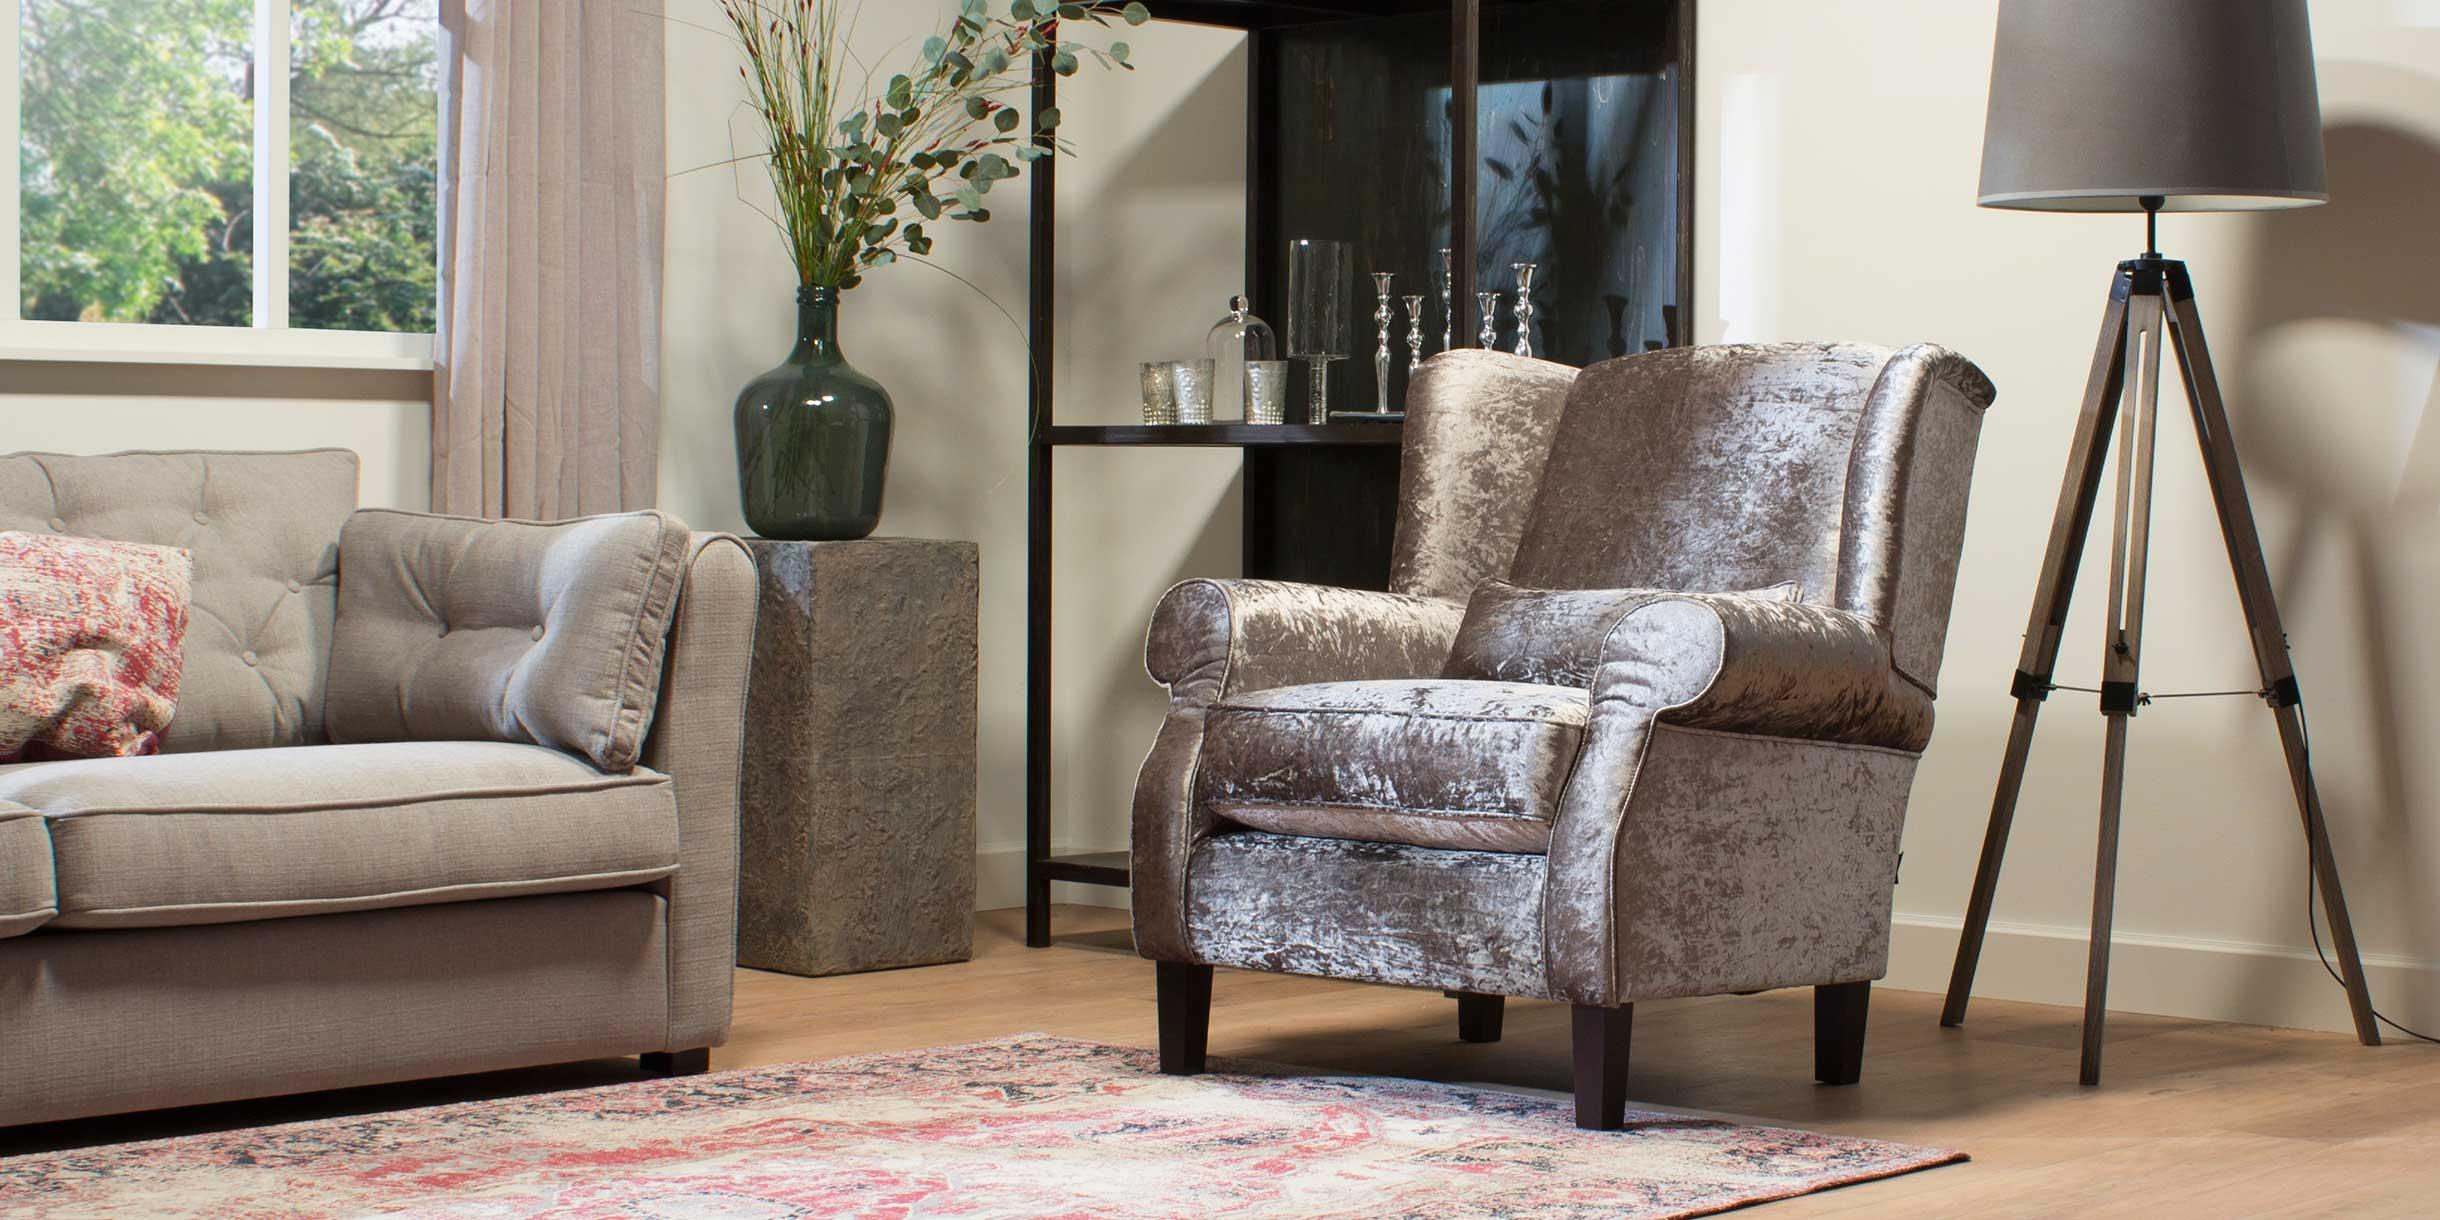 UrbanSofa-Chelsey-fauteuil